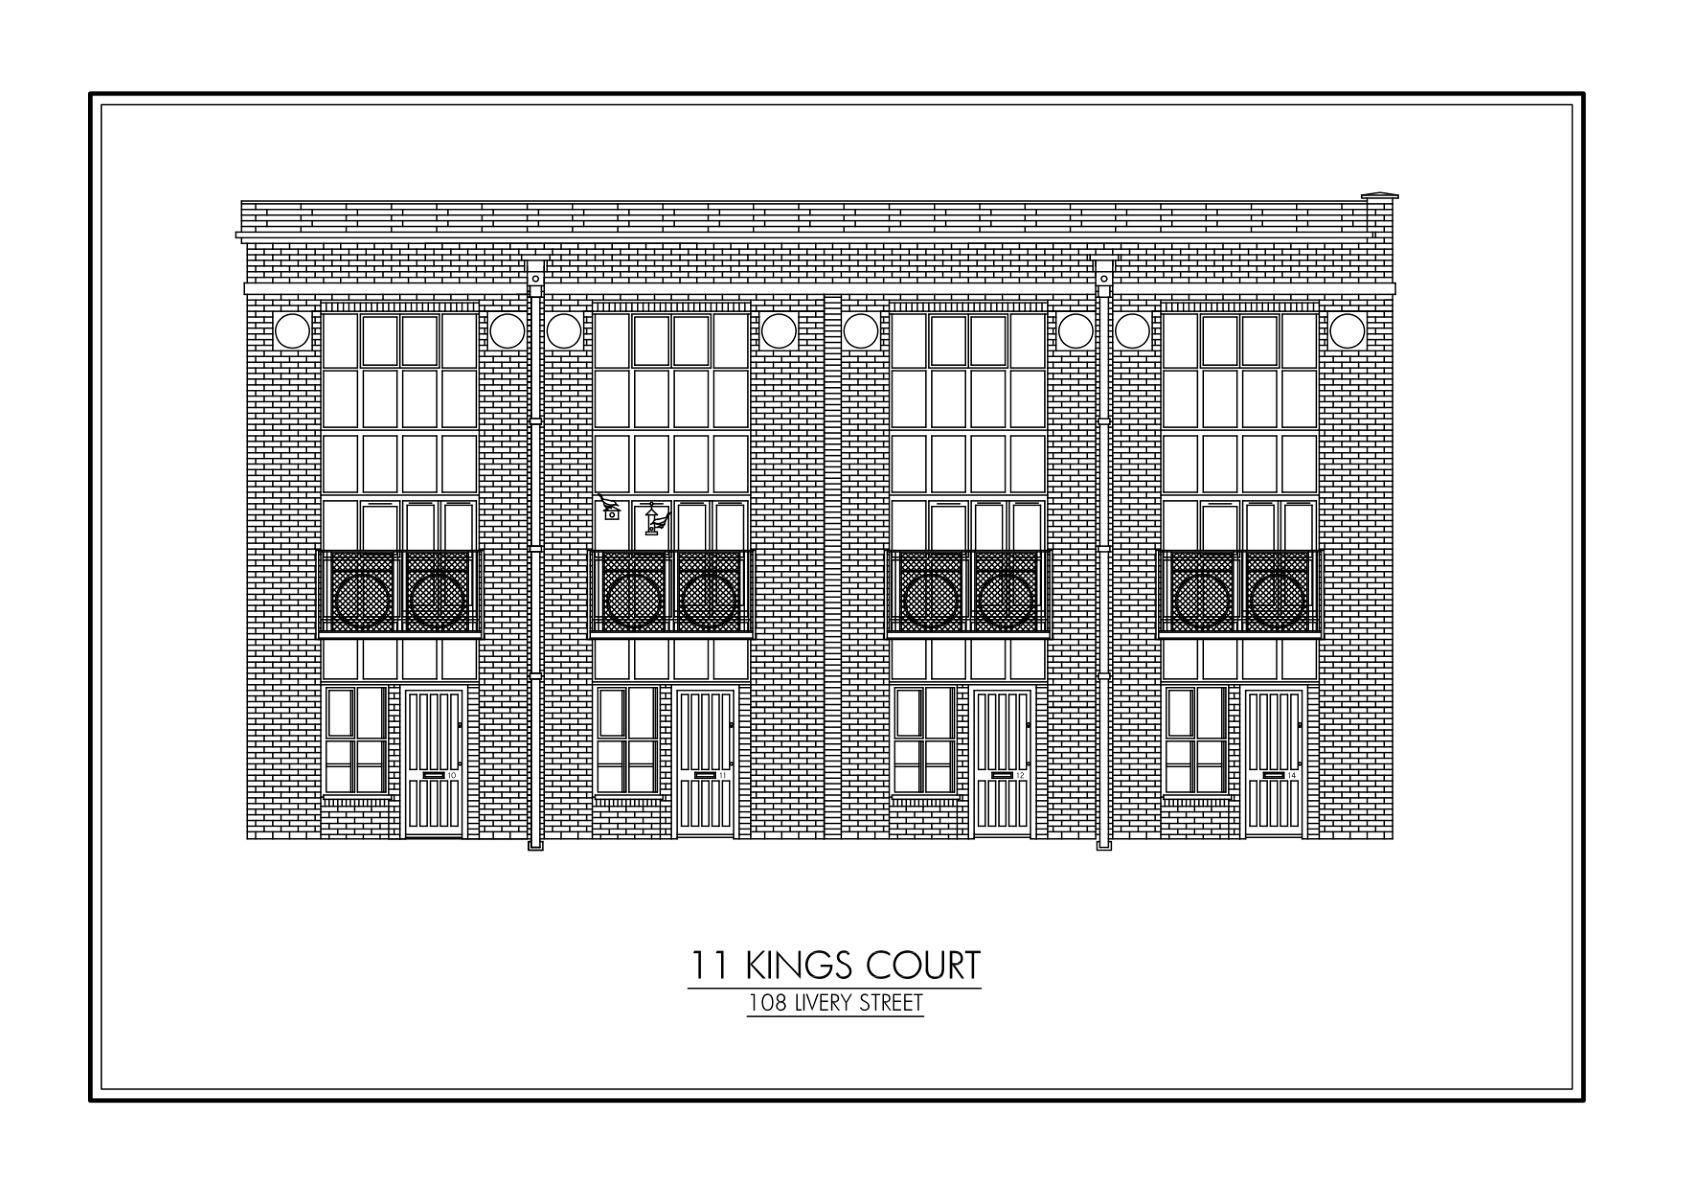 Kings Court (A4).jpg